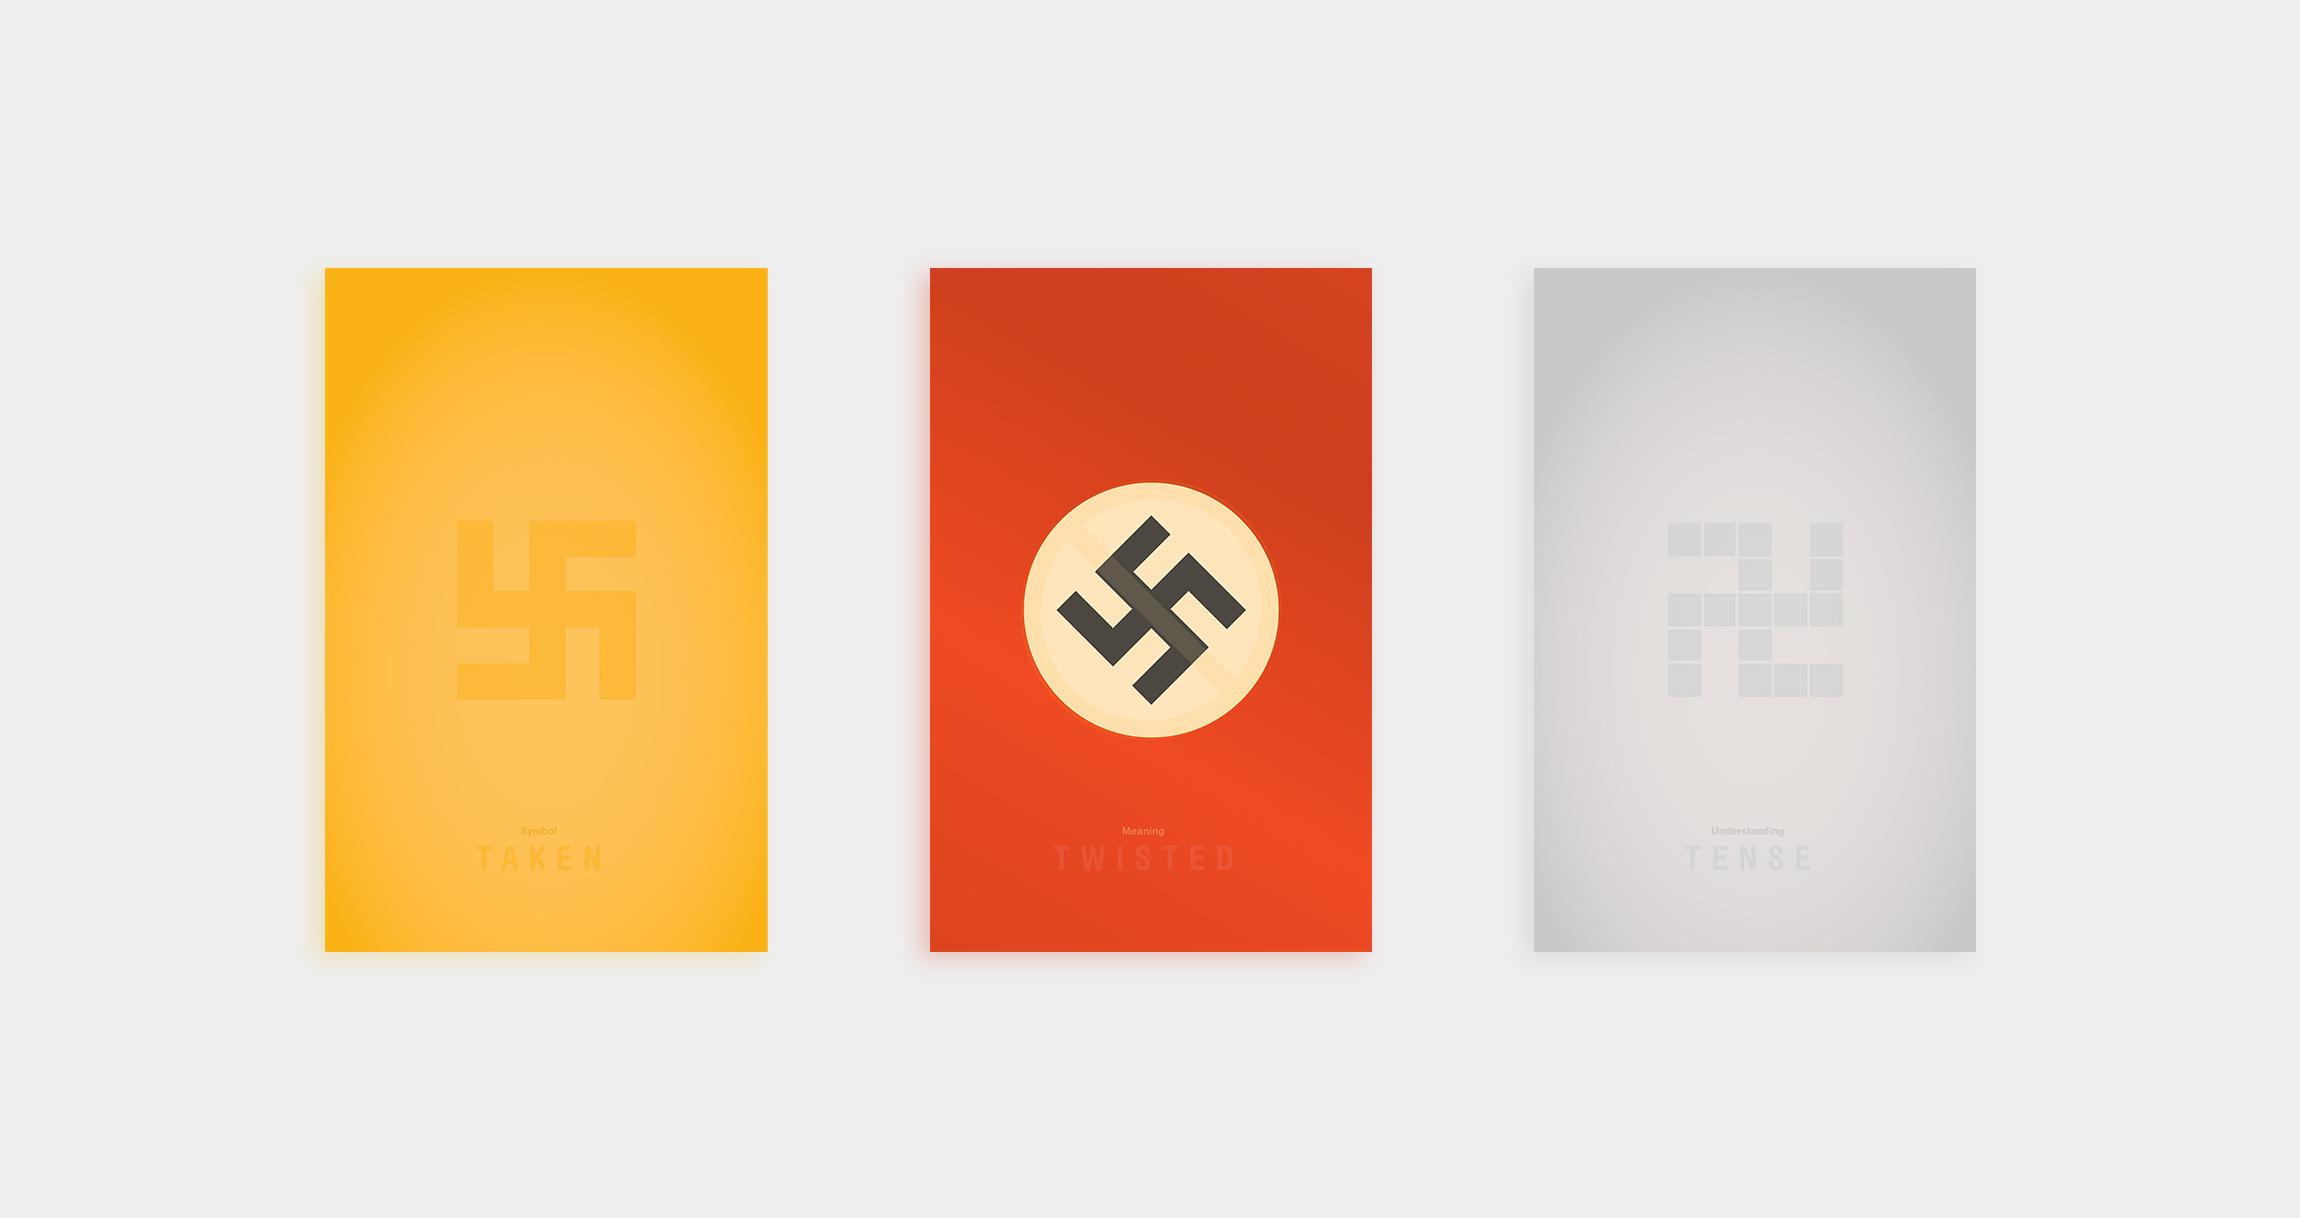 symbolism-poster-series-display-image-1